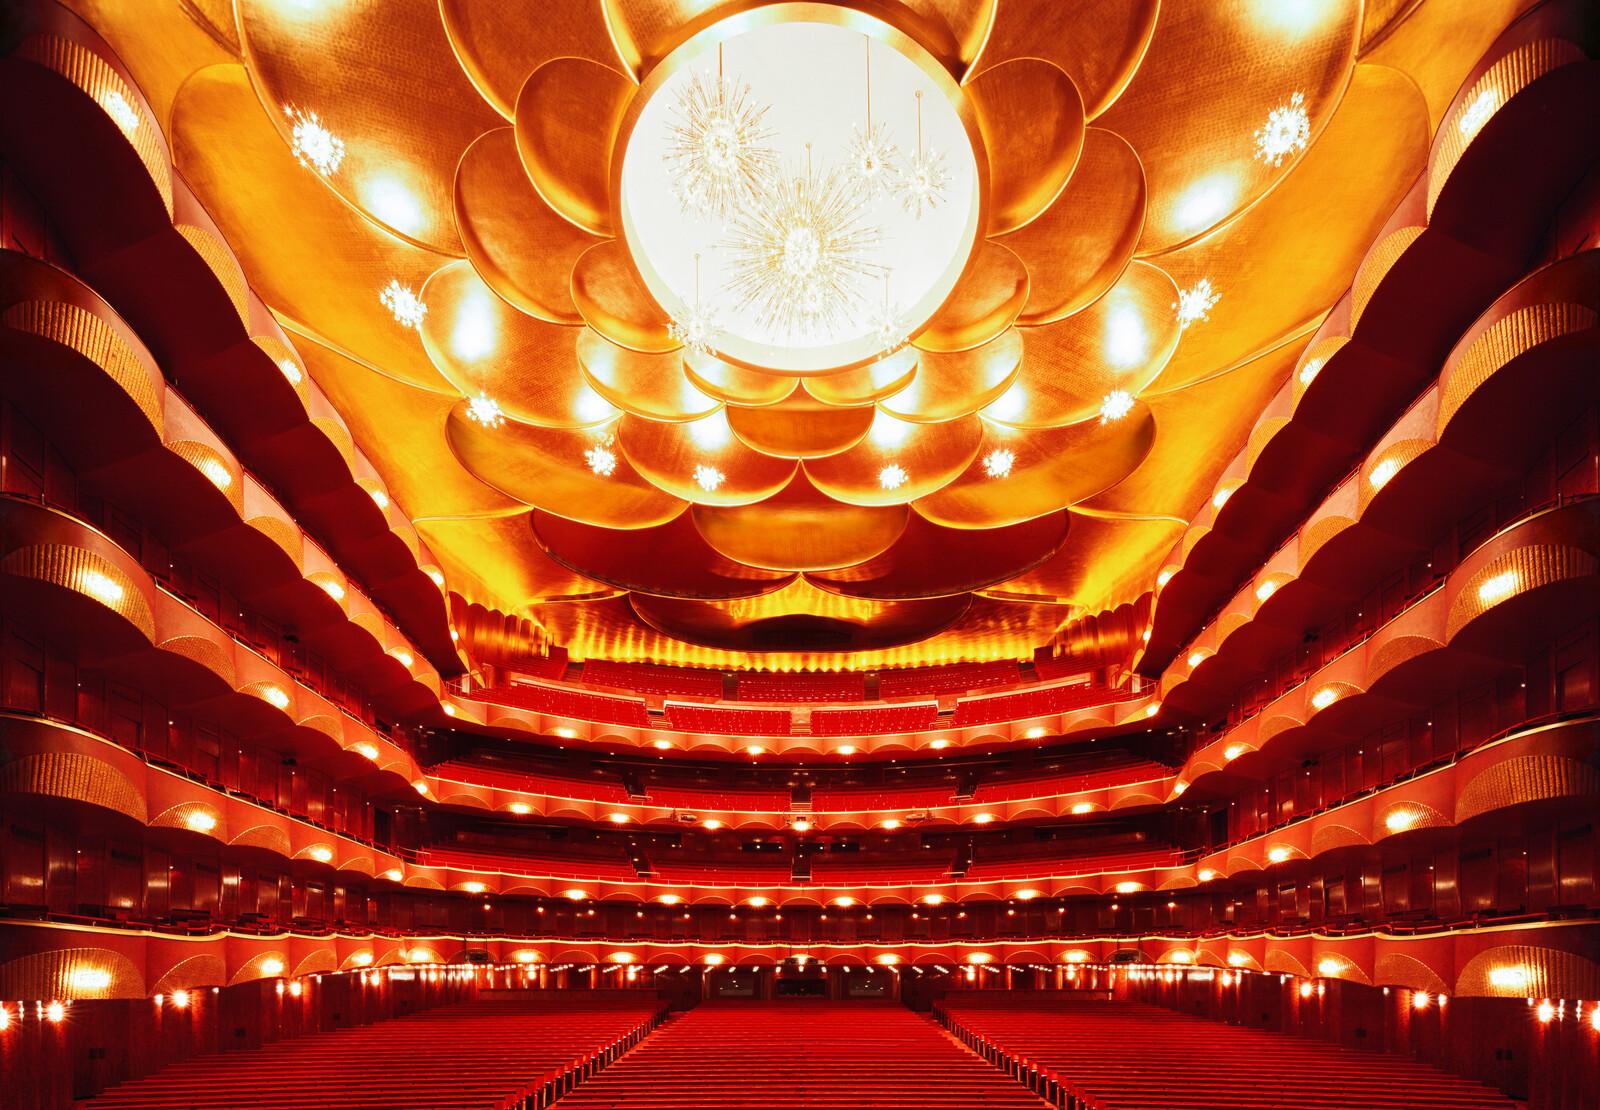 Metropolitan Opera New York City - Rafael Neff